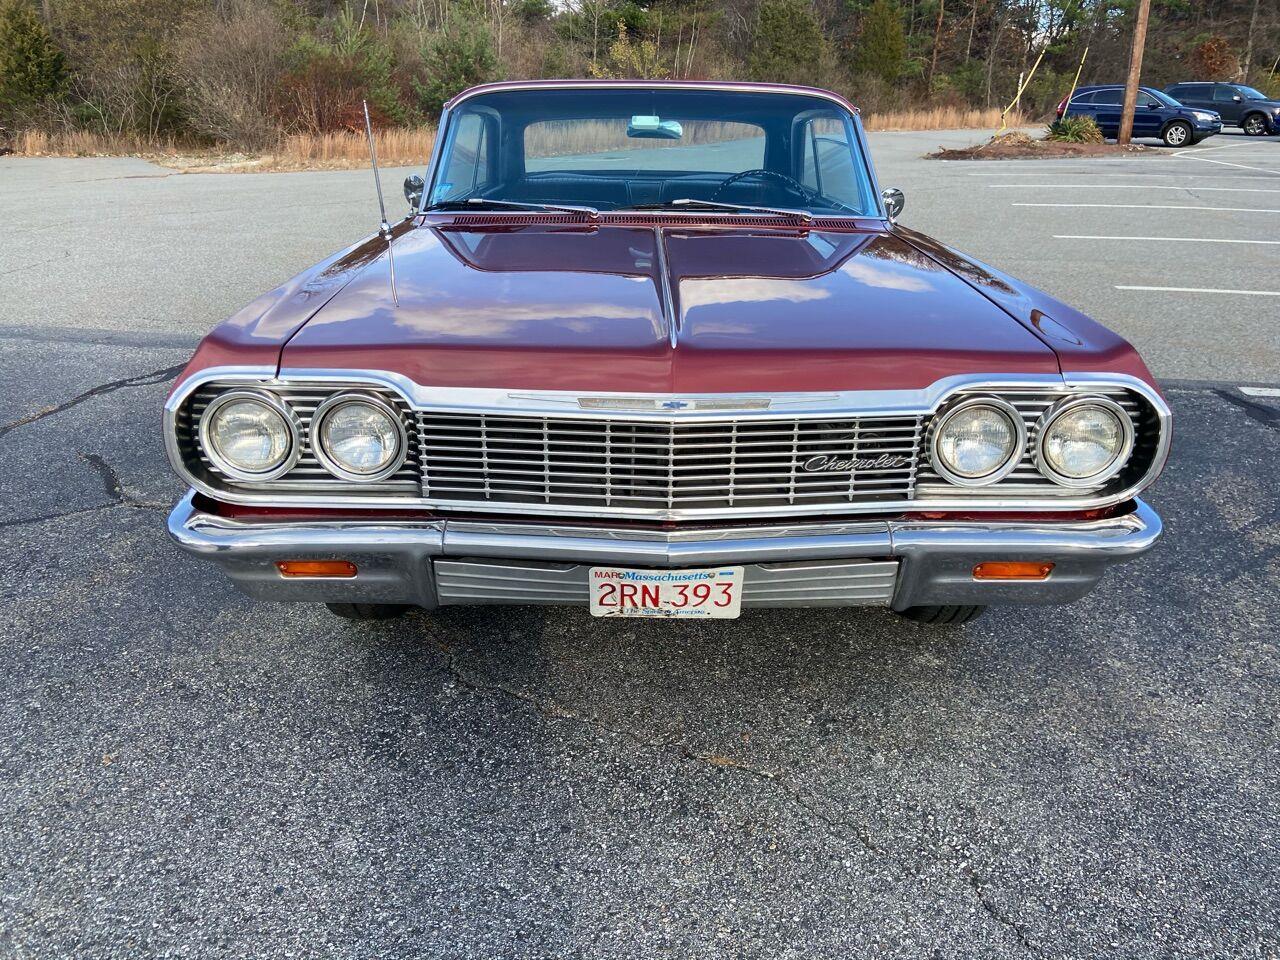 1964 Chevrolet Impala (CC-1422749) for sale in Westford, Massachusetts